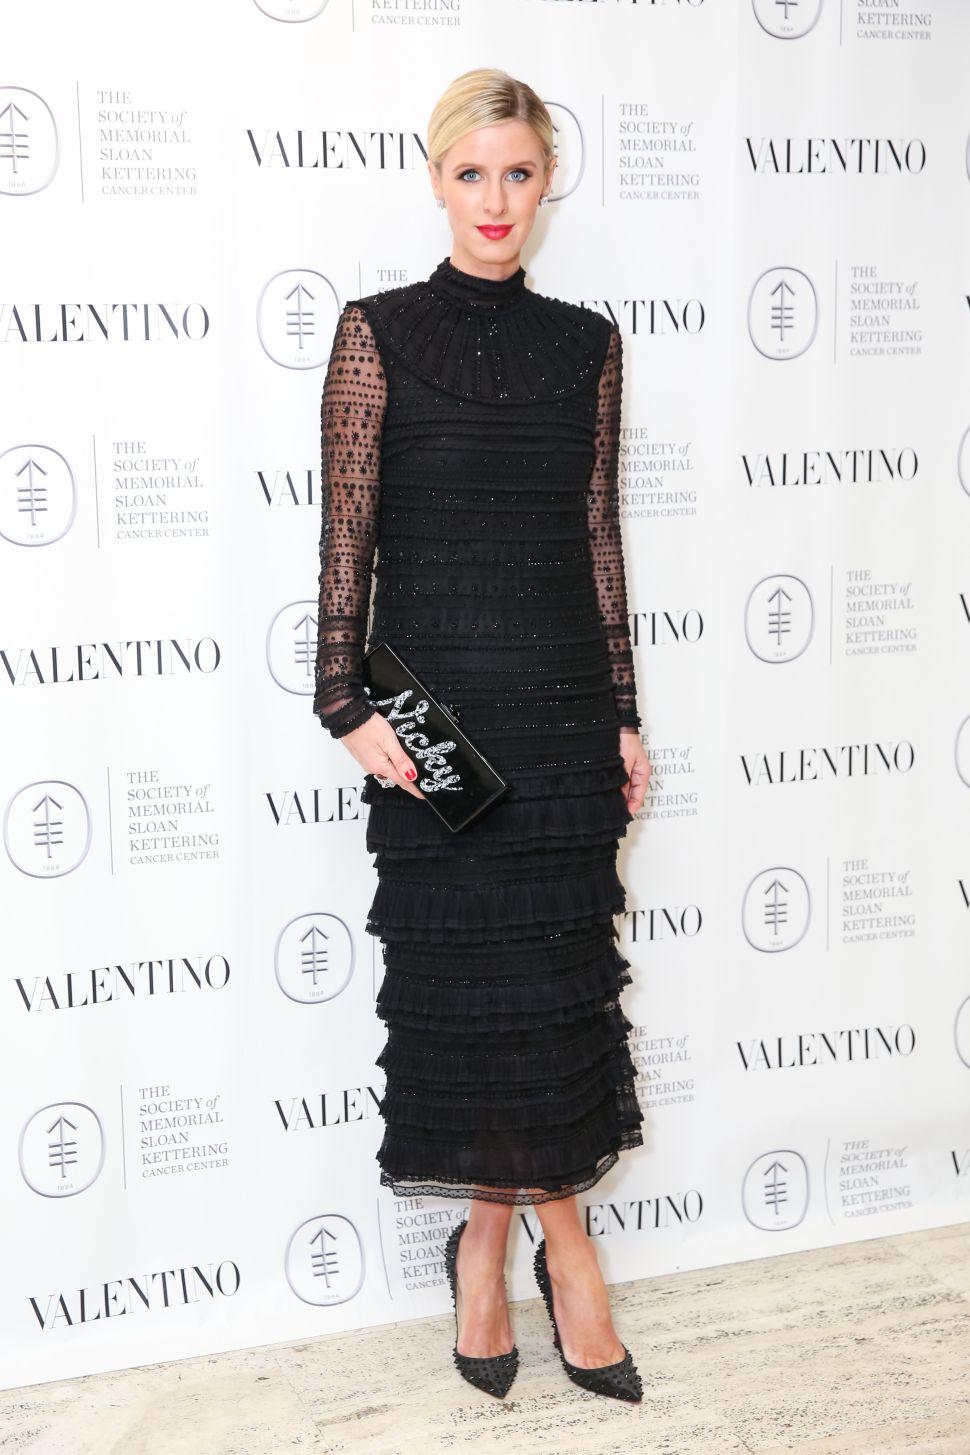 Nicky Hilton wearing Valentino (Photo: The Society of MSKCC).